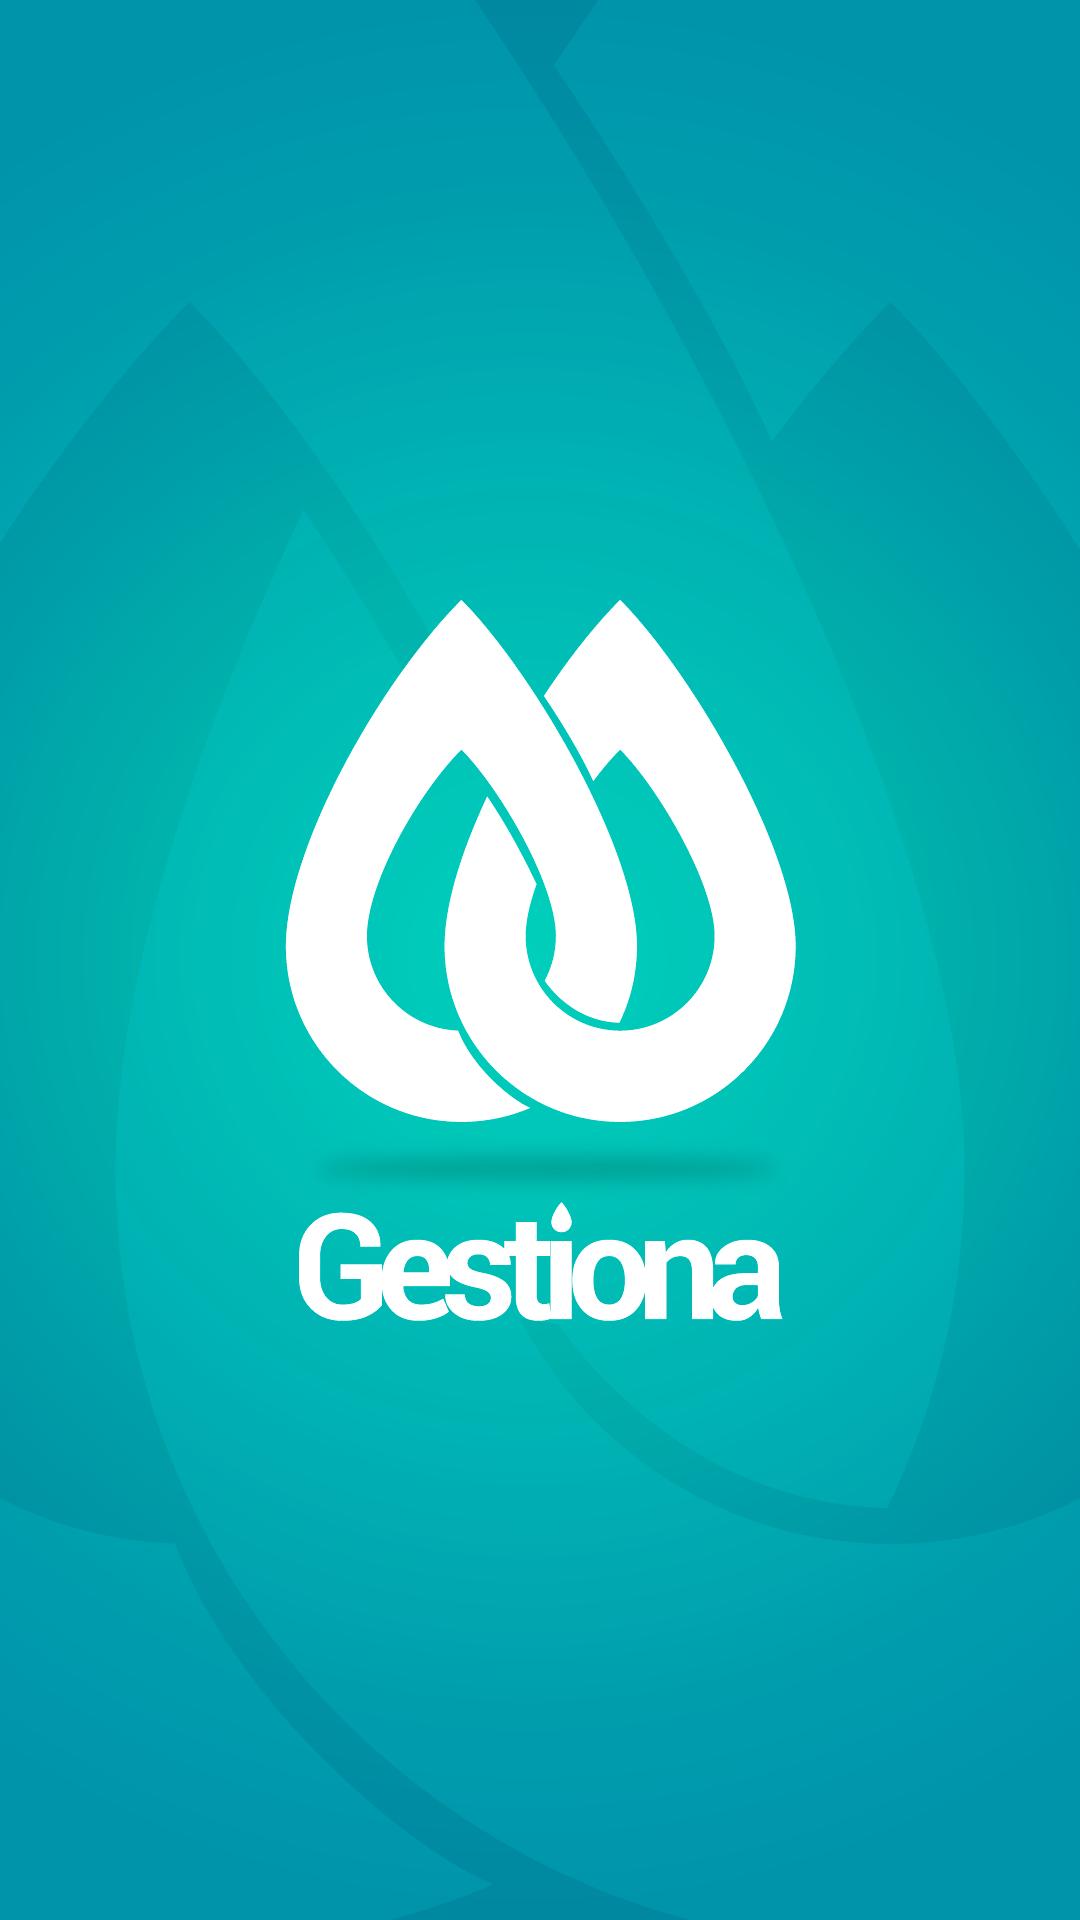 Gestiona